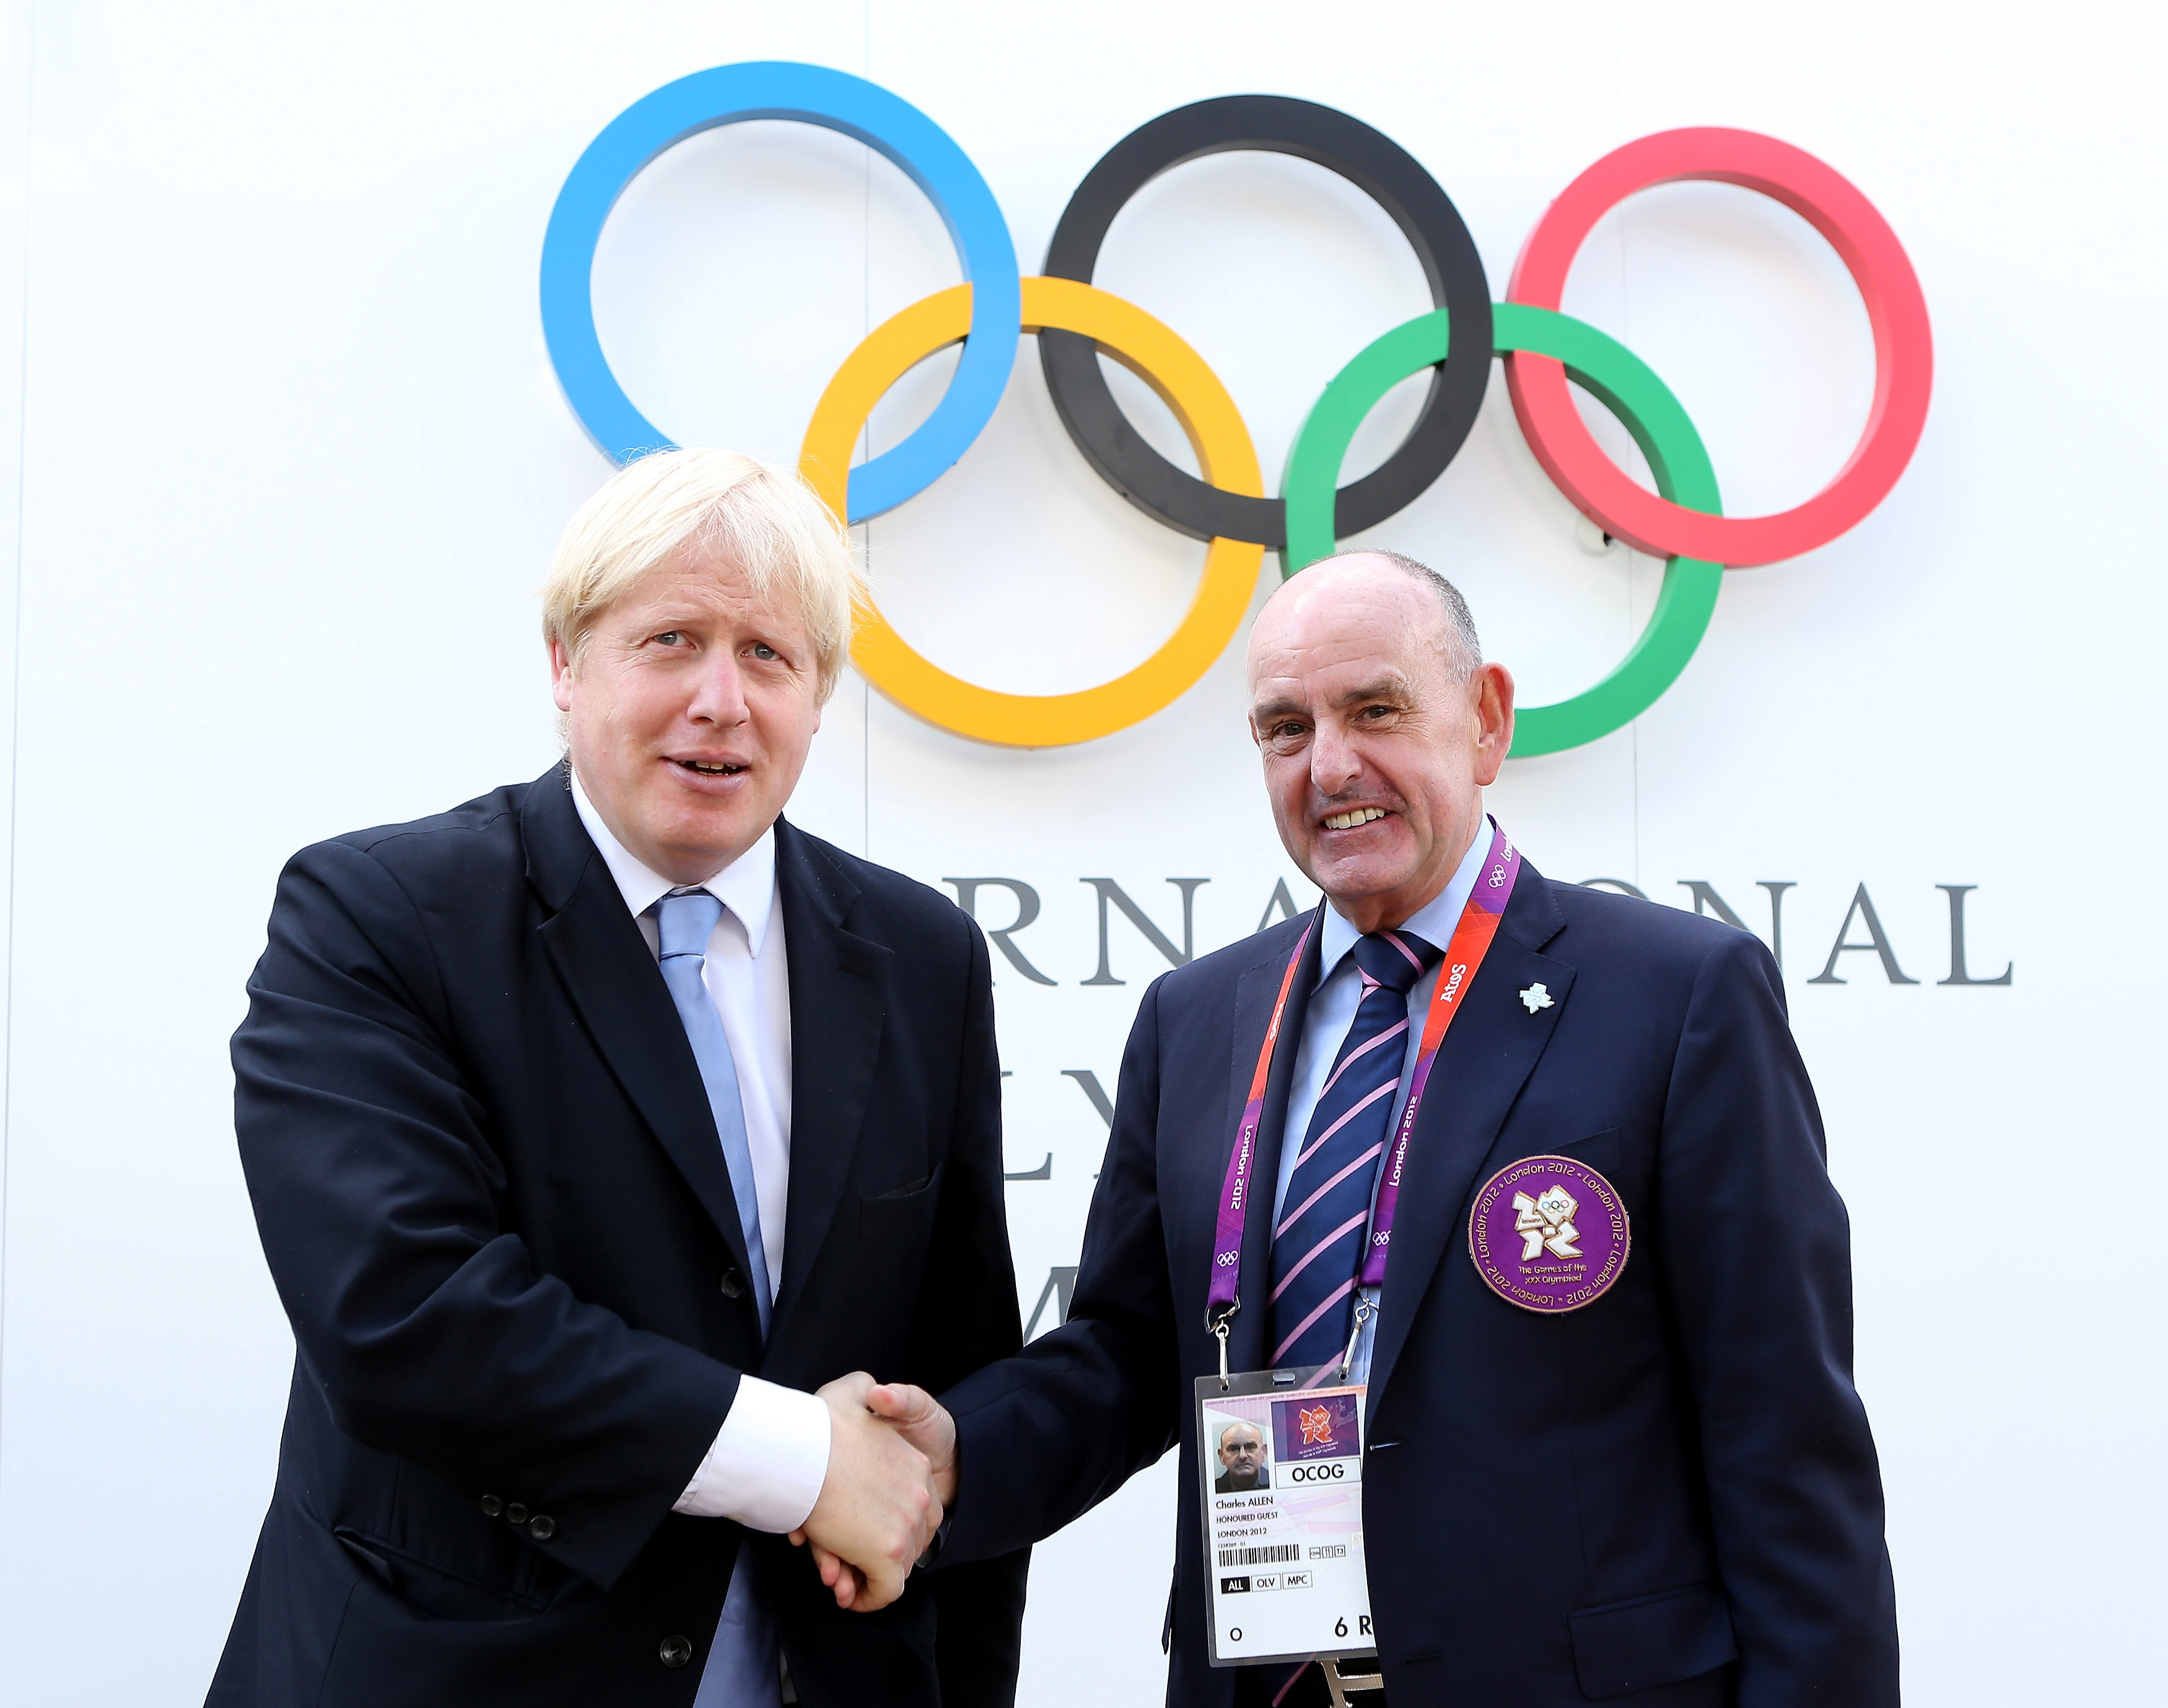 Mayor of London Boris Johnson meets Mayor of the Olympic Village Sir Charles Allen as he visits the Olympic Park and Olympic Village in London.